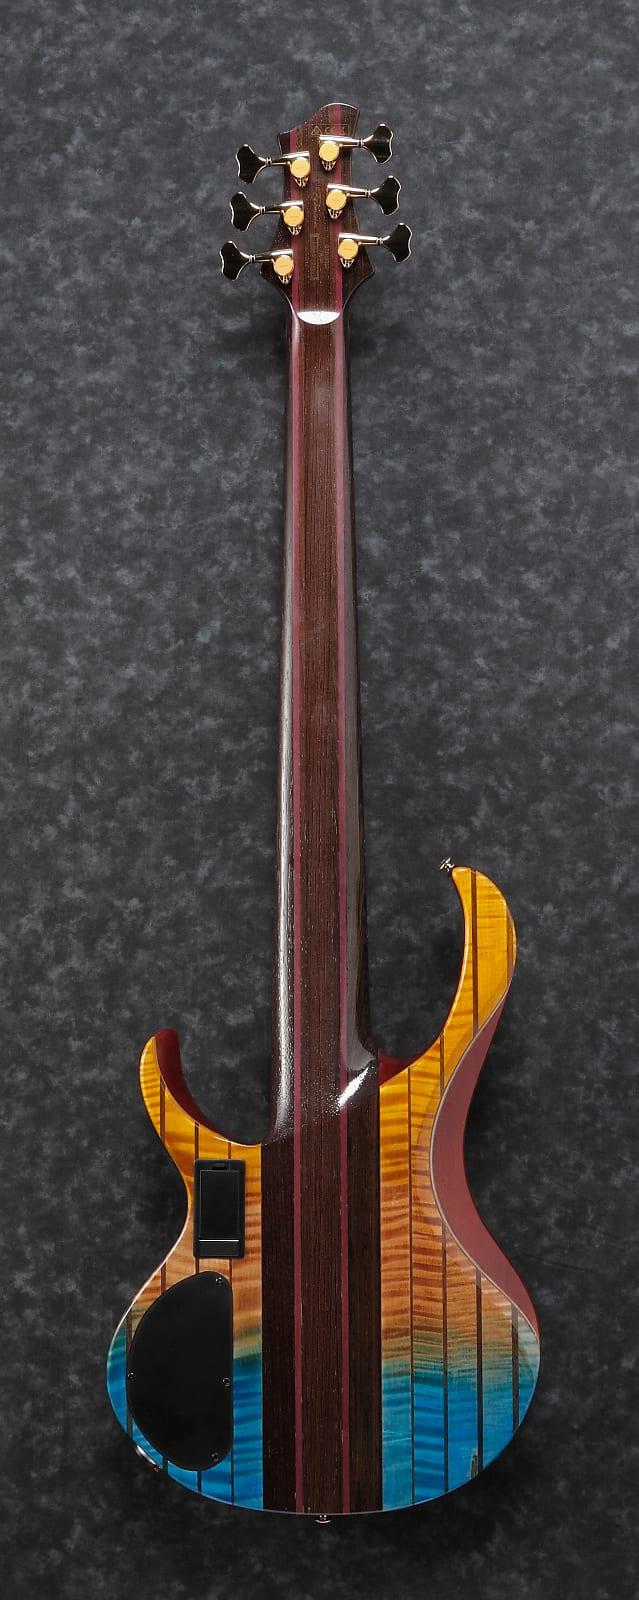 Ibanez BTB Premium Series E-Bass 6 String Sunset Fade Low Gloss + Bag